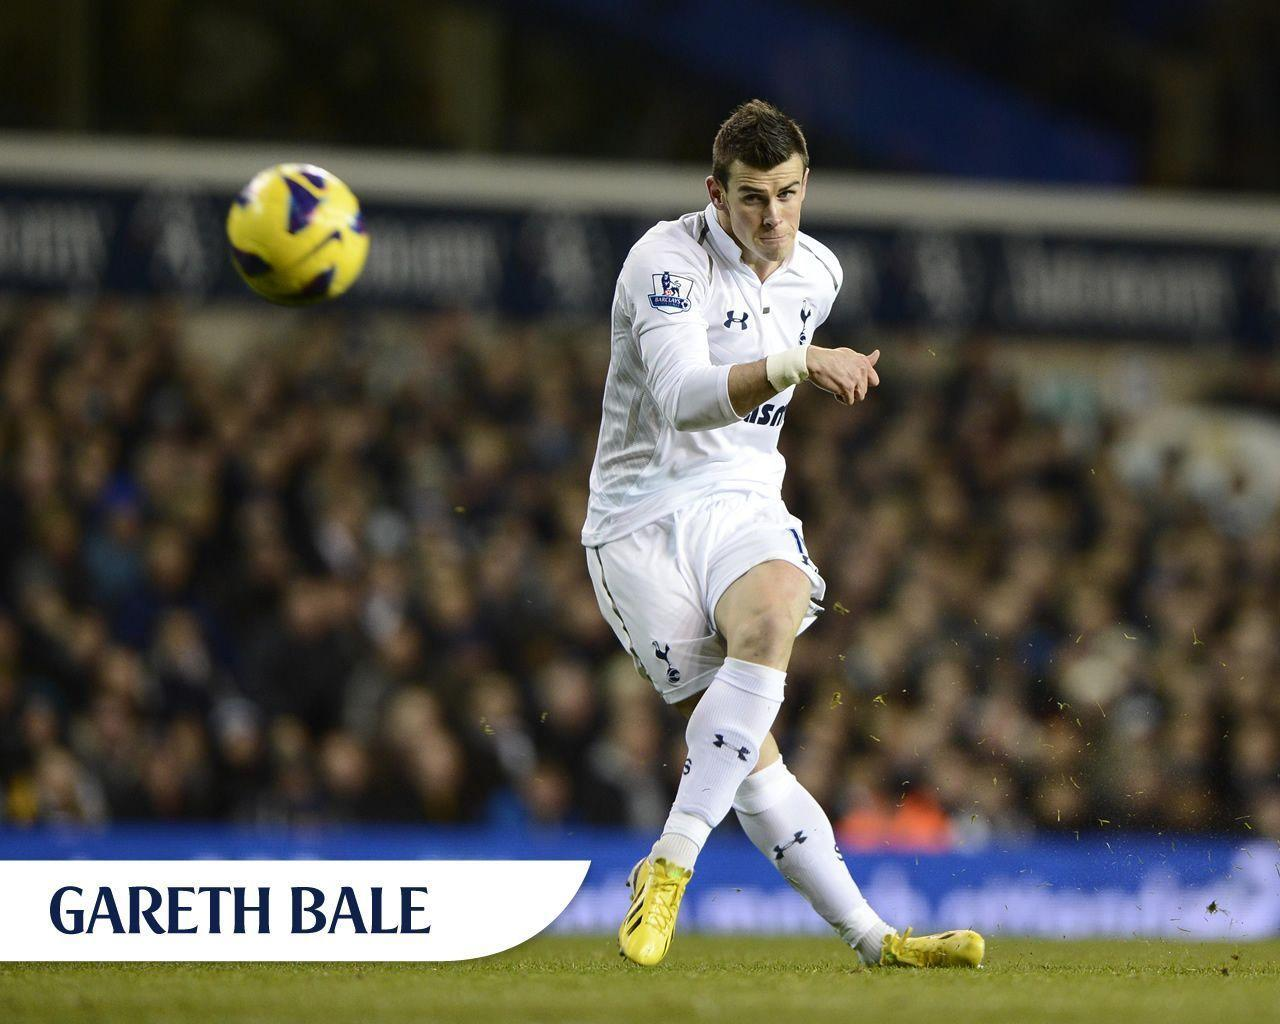 Gareth-Bale-Tottenham-Hotspurs ...